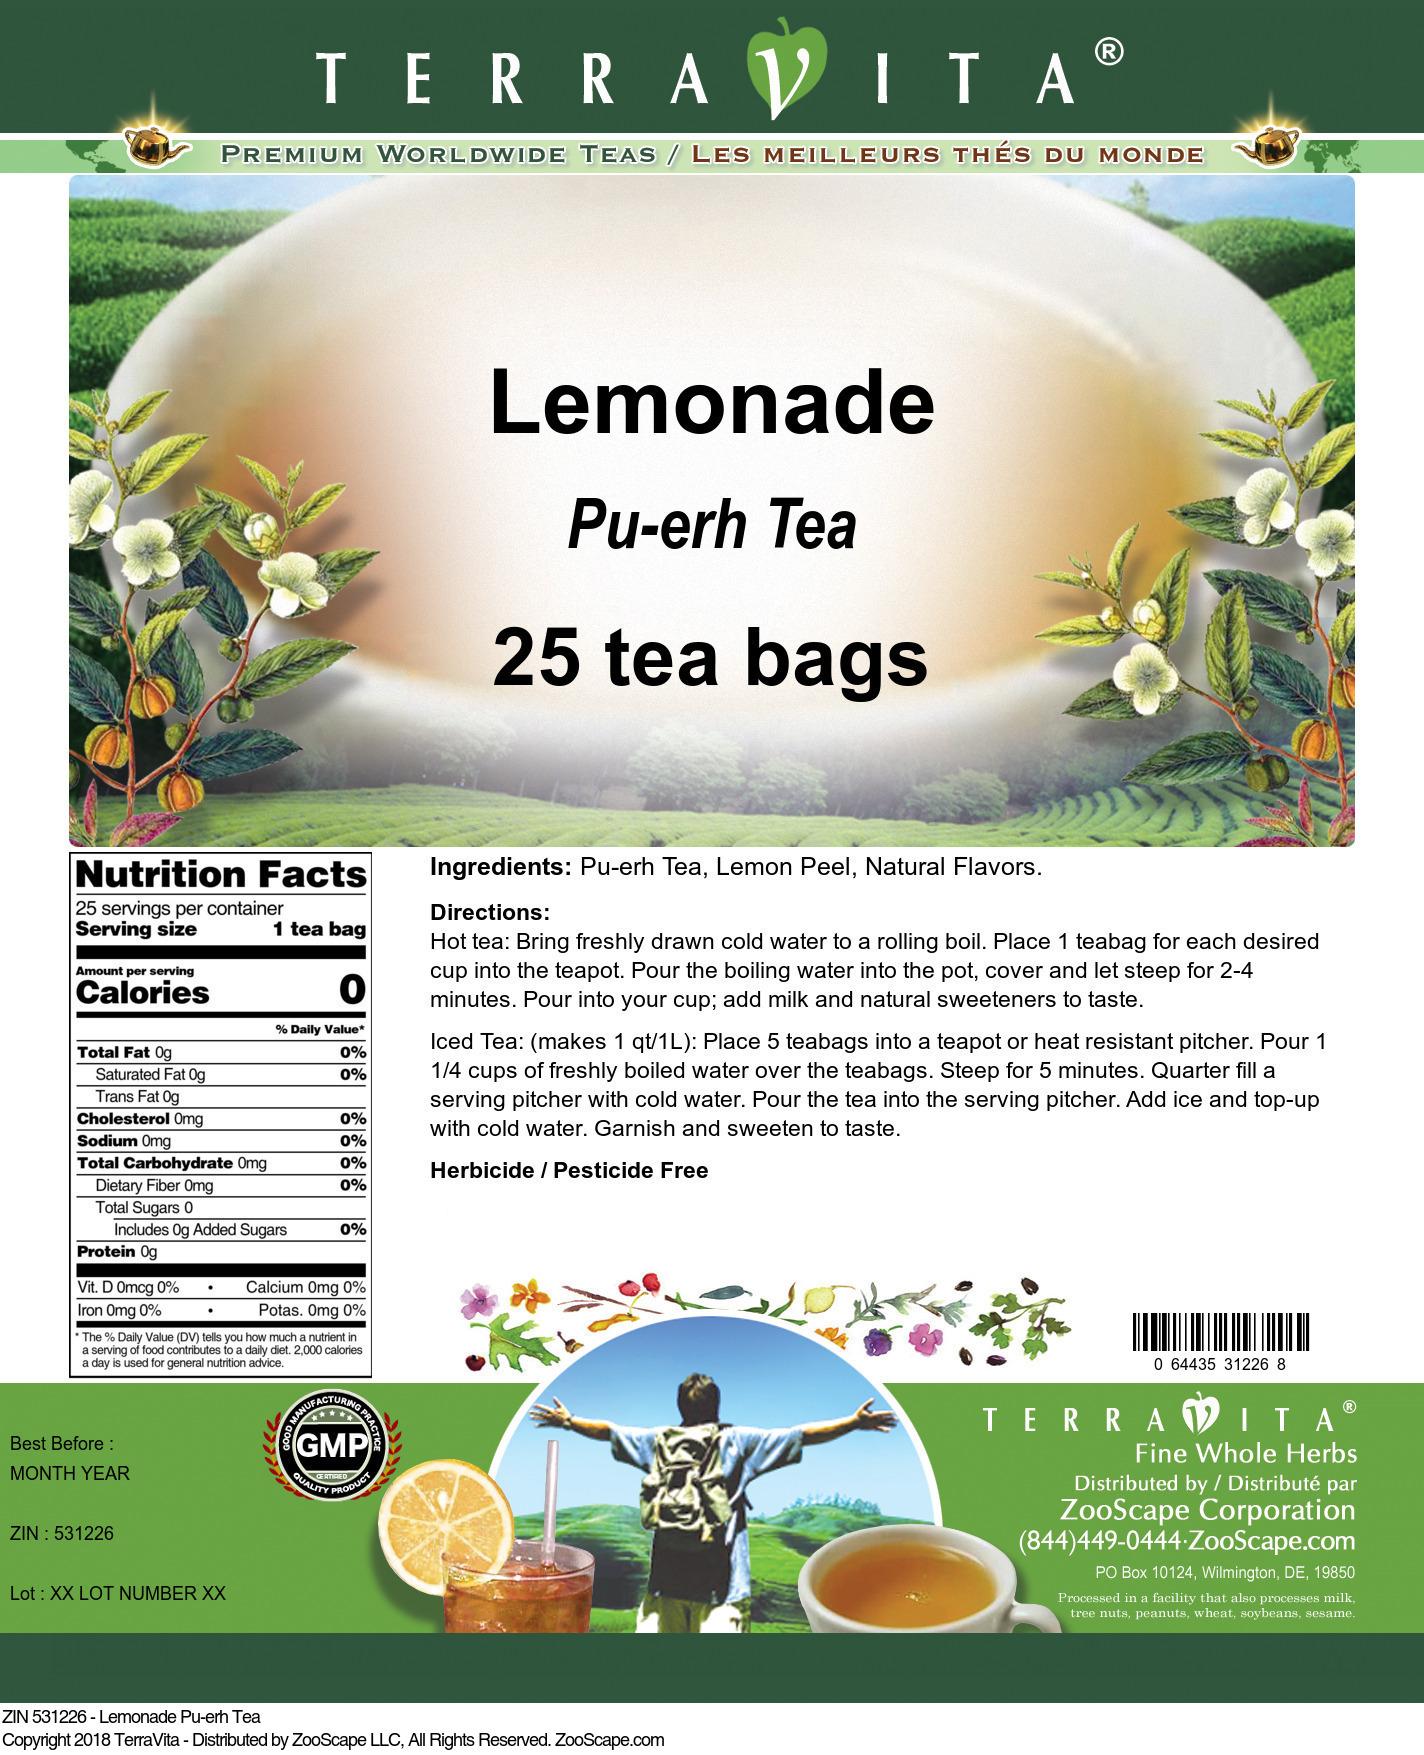 Lemonade Pu-erh Tea